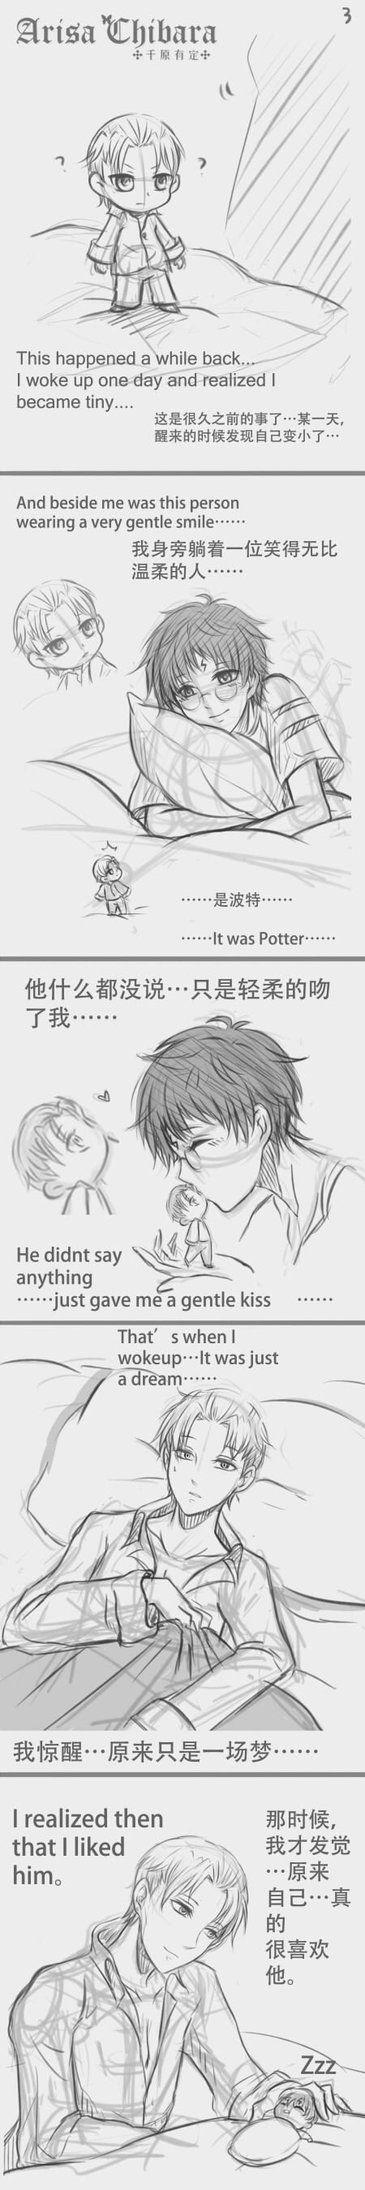 Drarry DoujinManga Pet Potter 03 by arisa-chibara